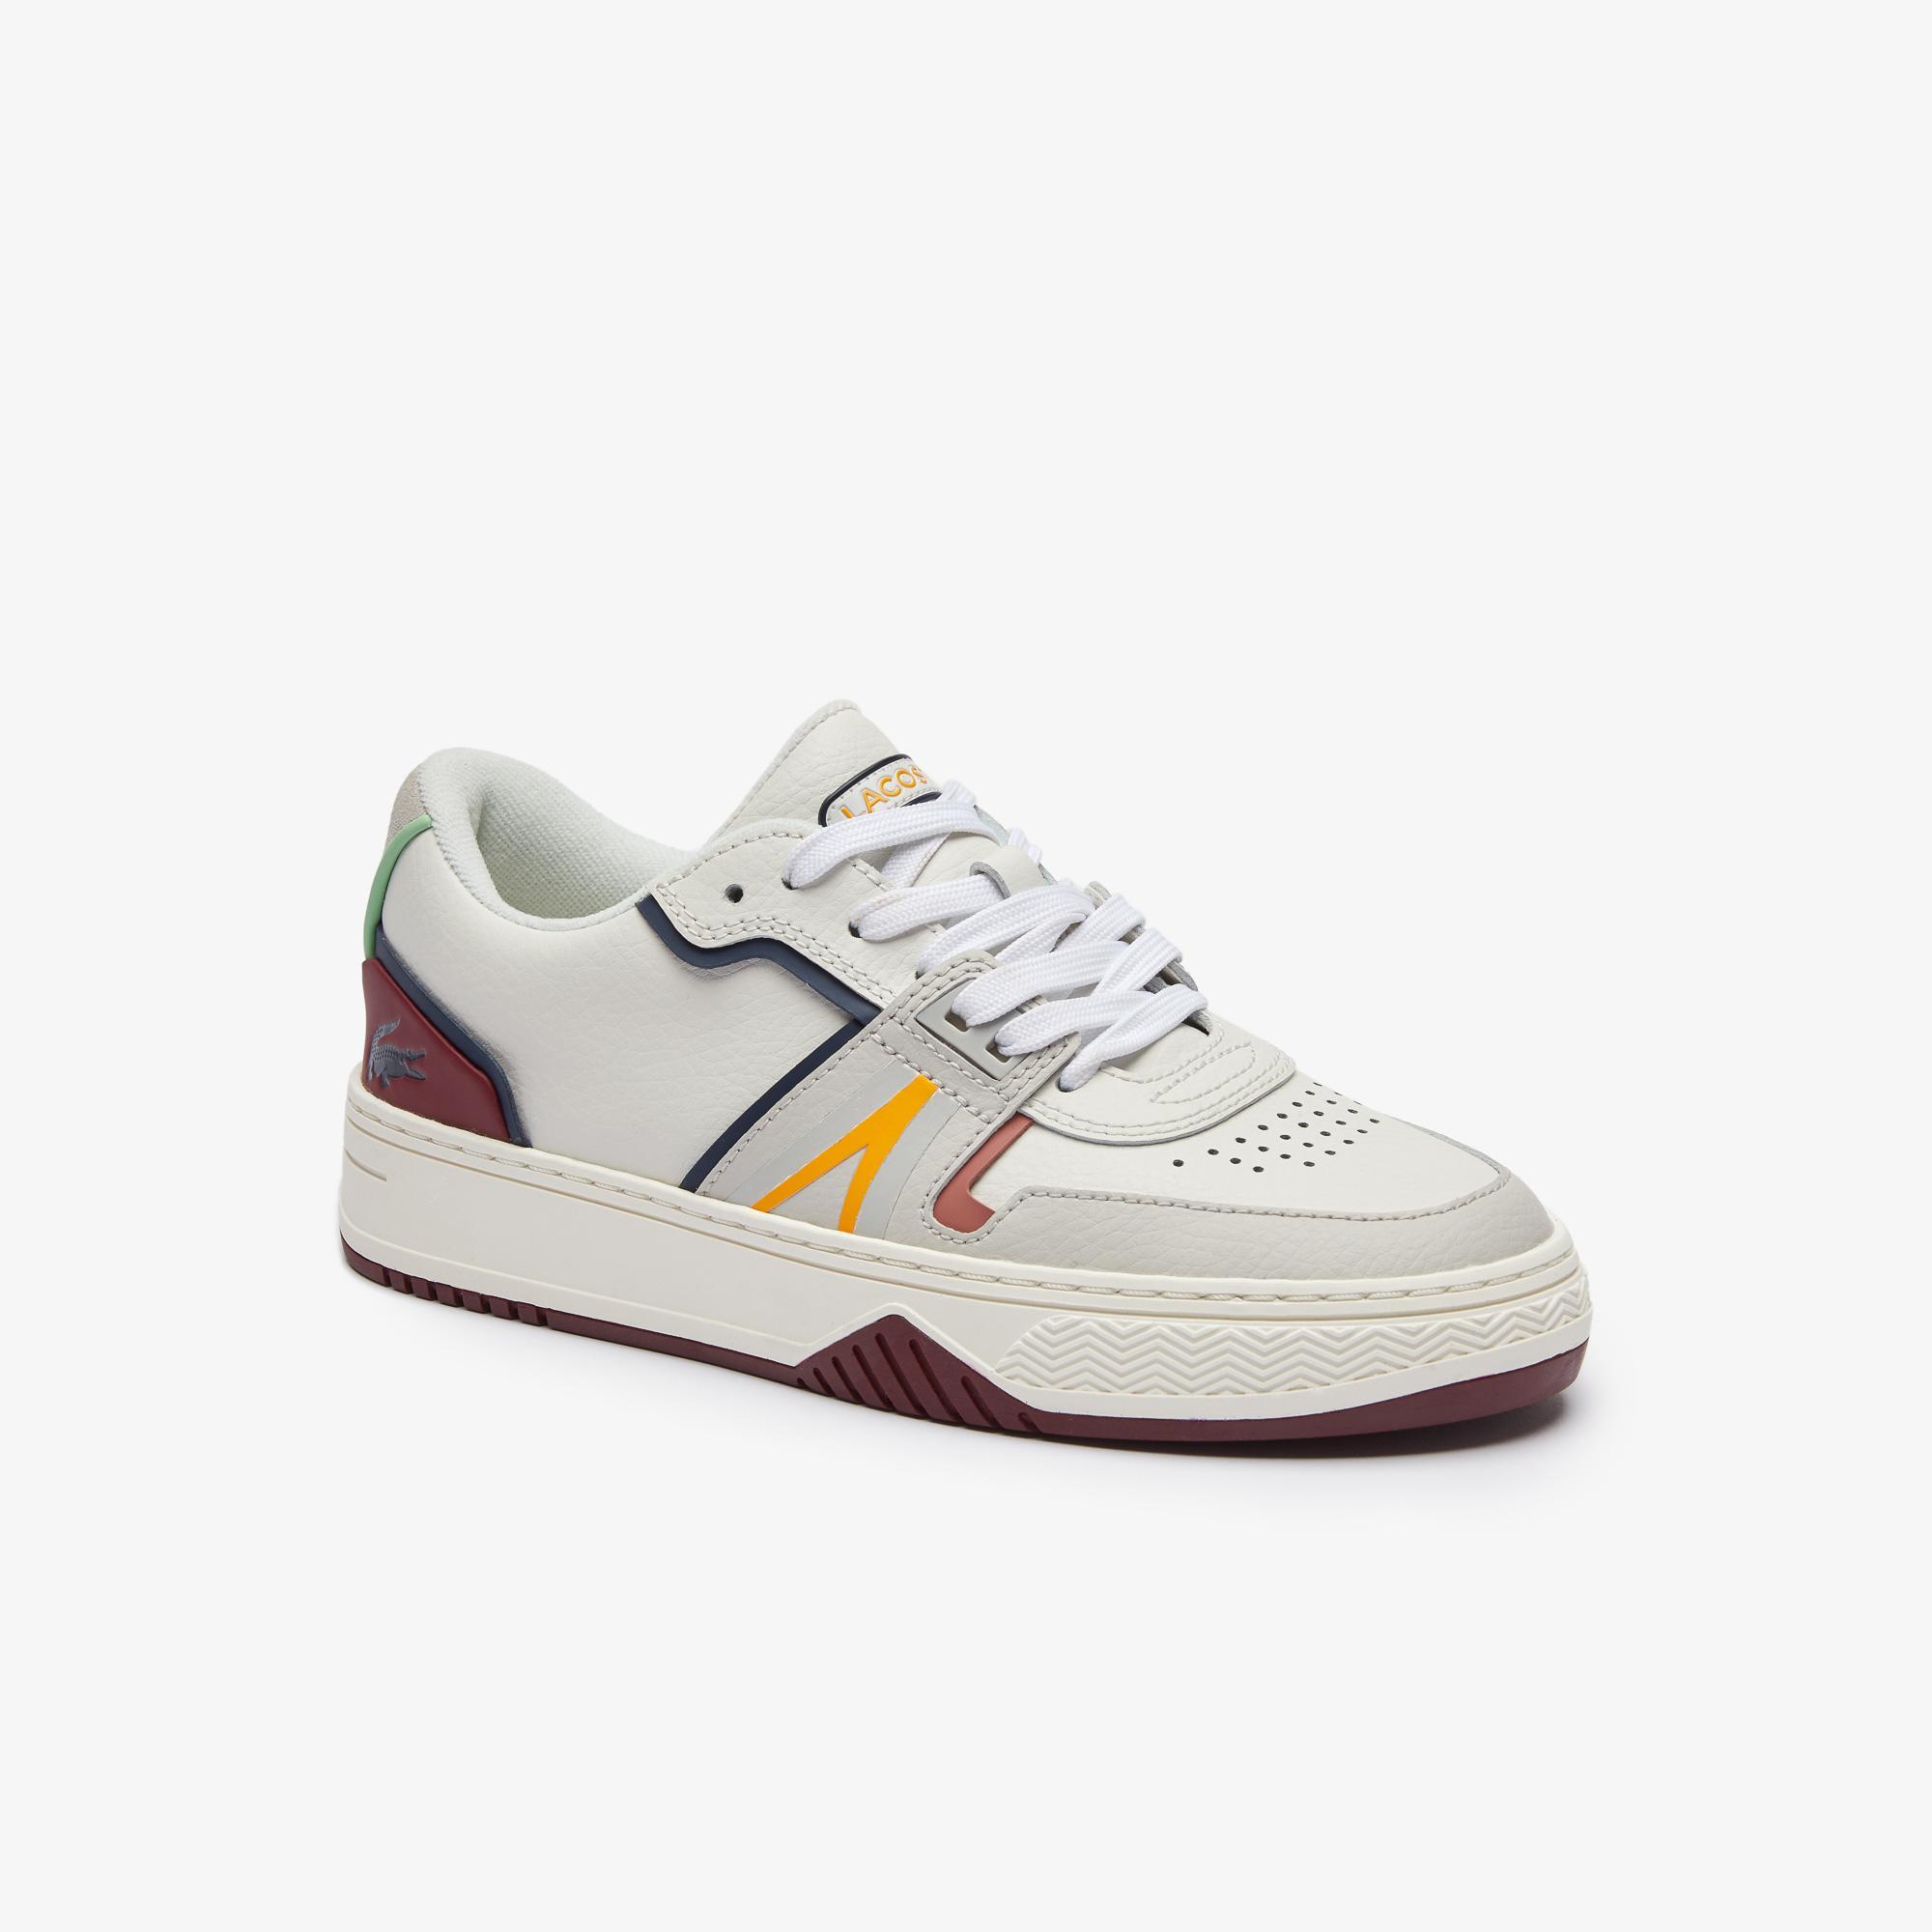 Lacoste L001 0321 1 Sfa Kadın Deri Beyaz Sneaker